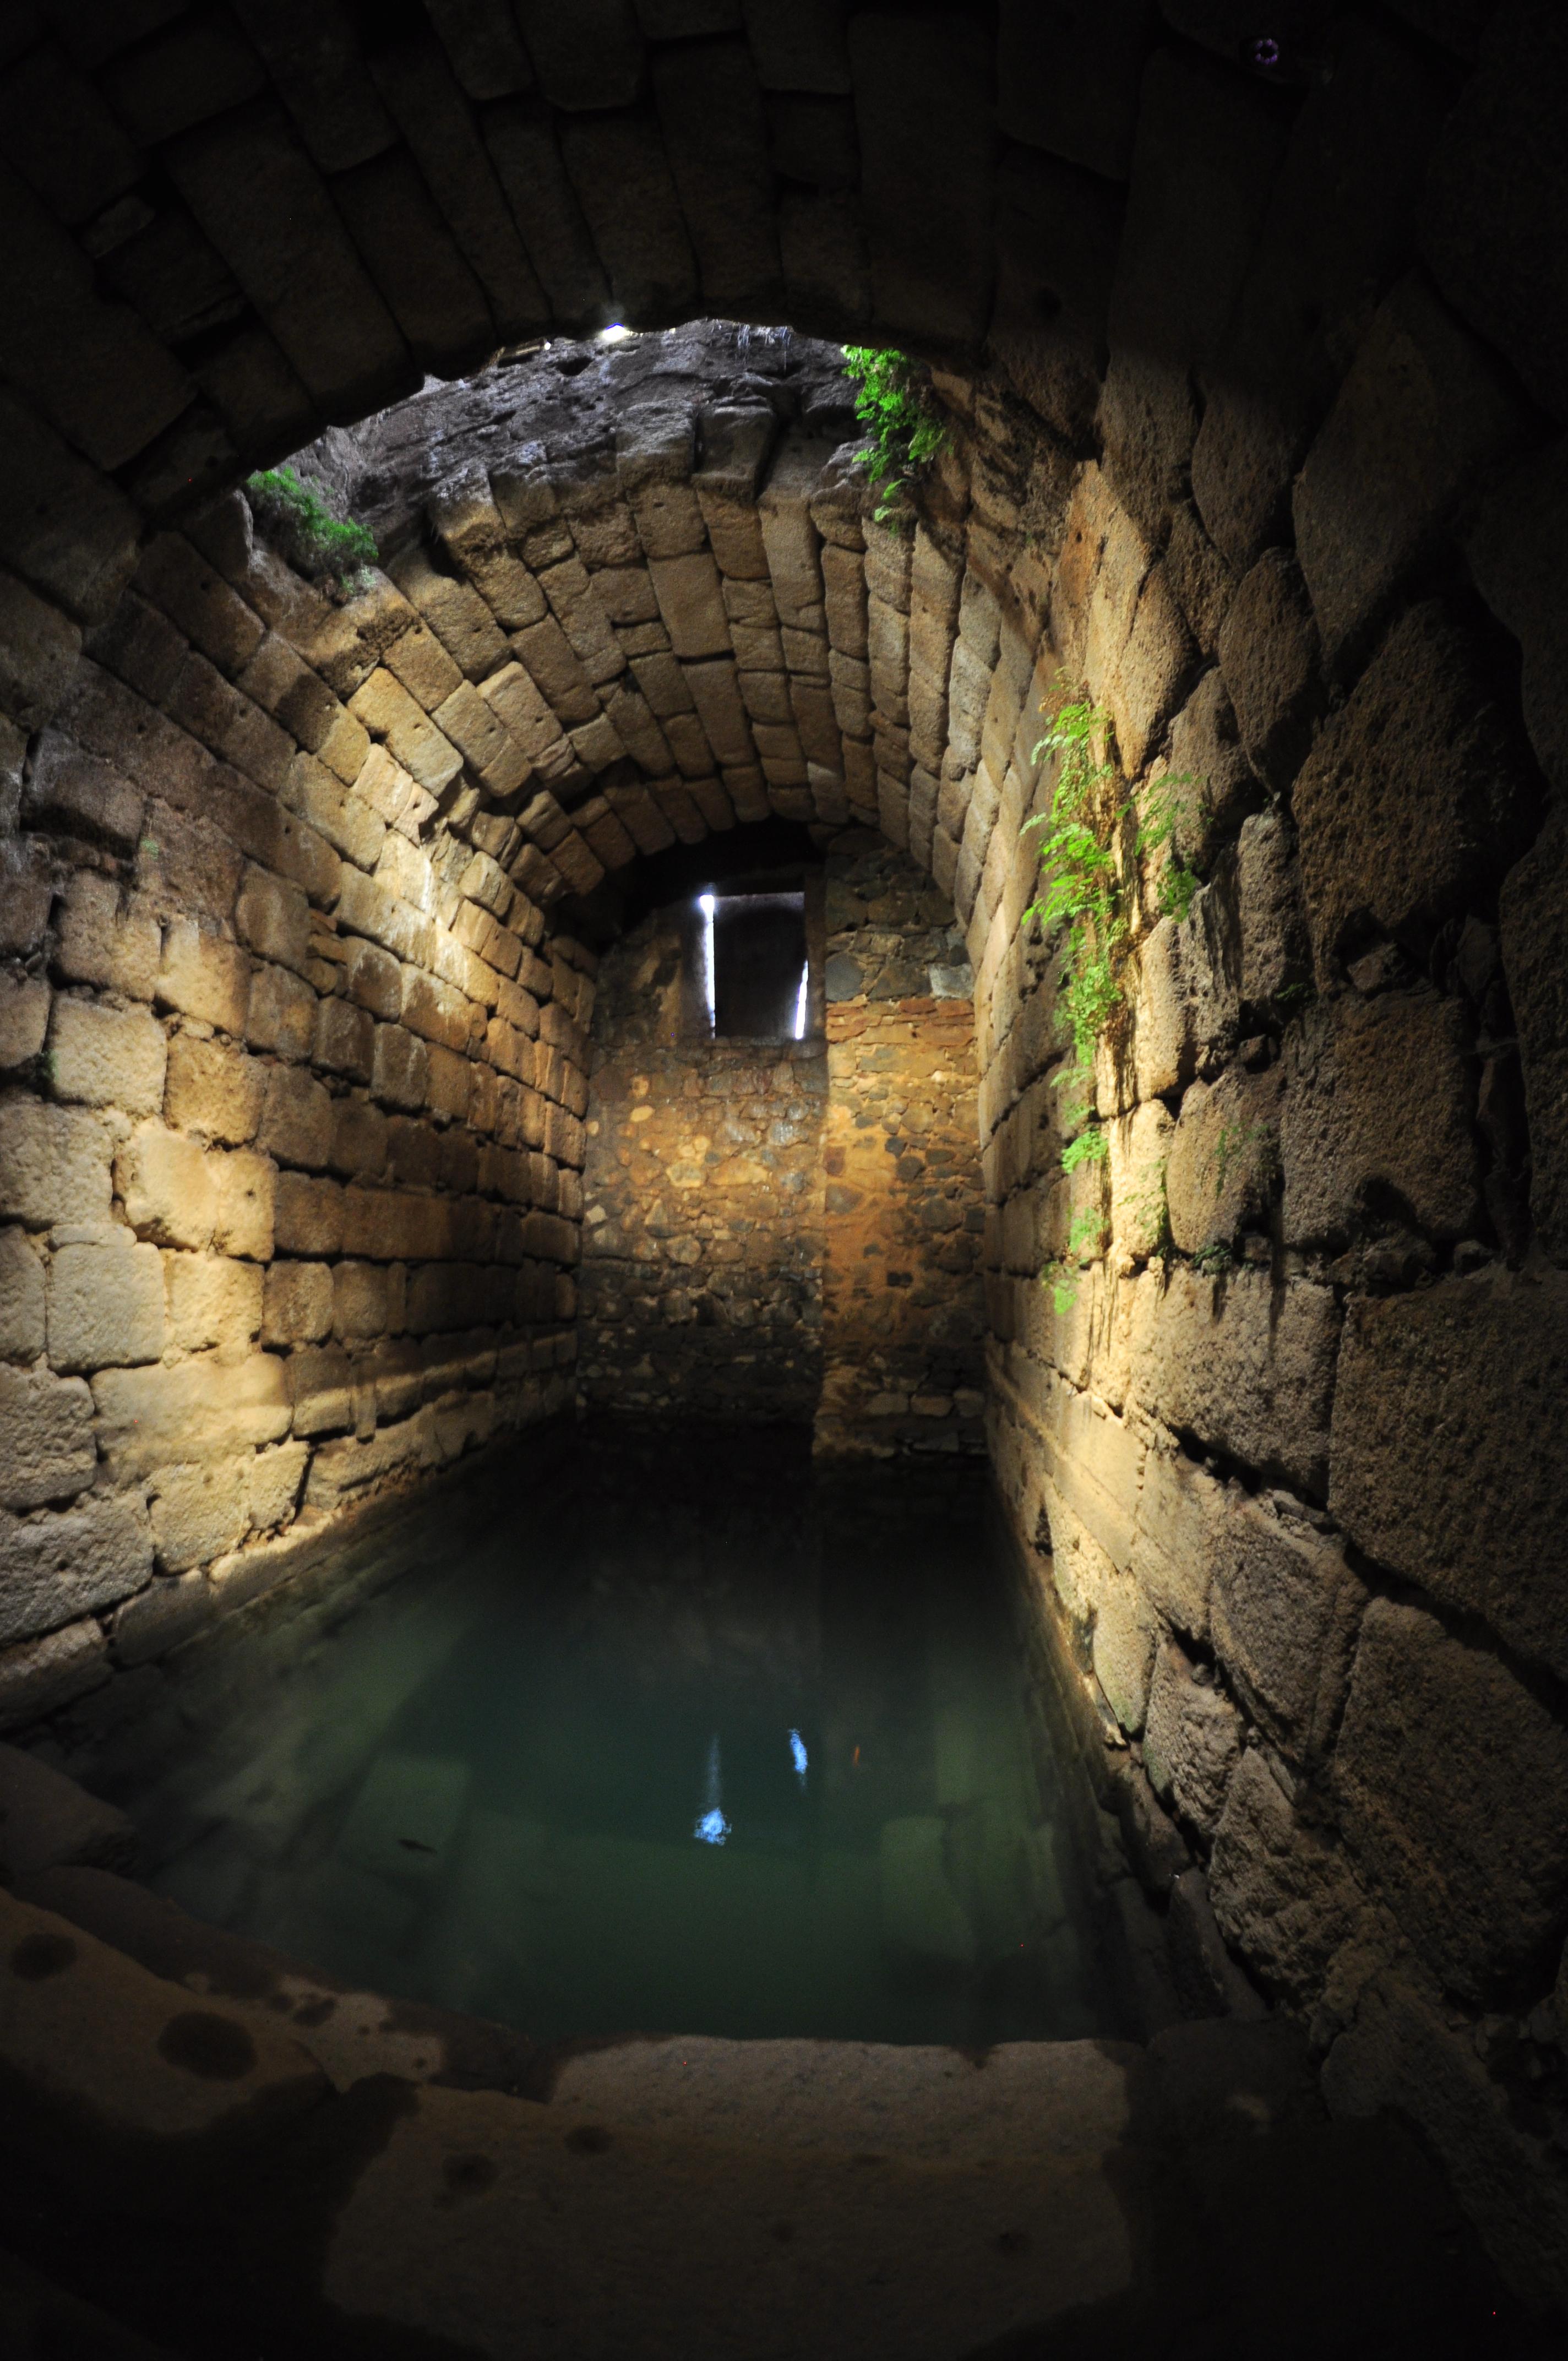 Cisternas de agua filtrada del río Guadiana El aljibe de la Alcazaba de Mérida - 14701356607 1bf3033d2e o - El aljibe de la Alcazaba de Mérida